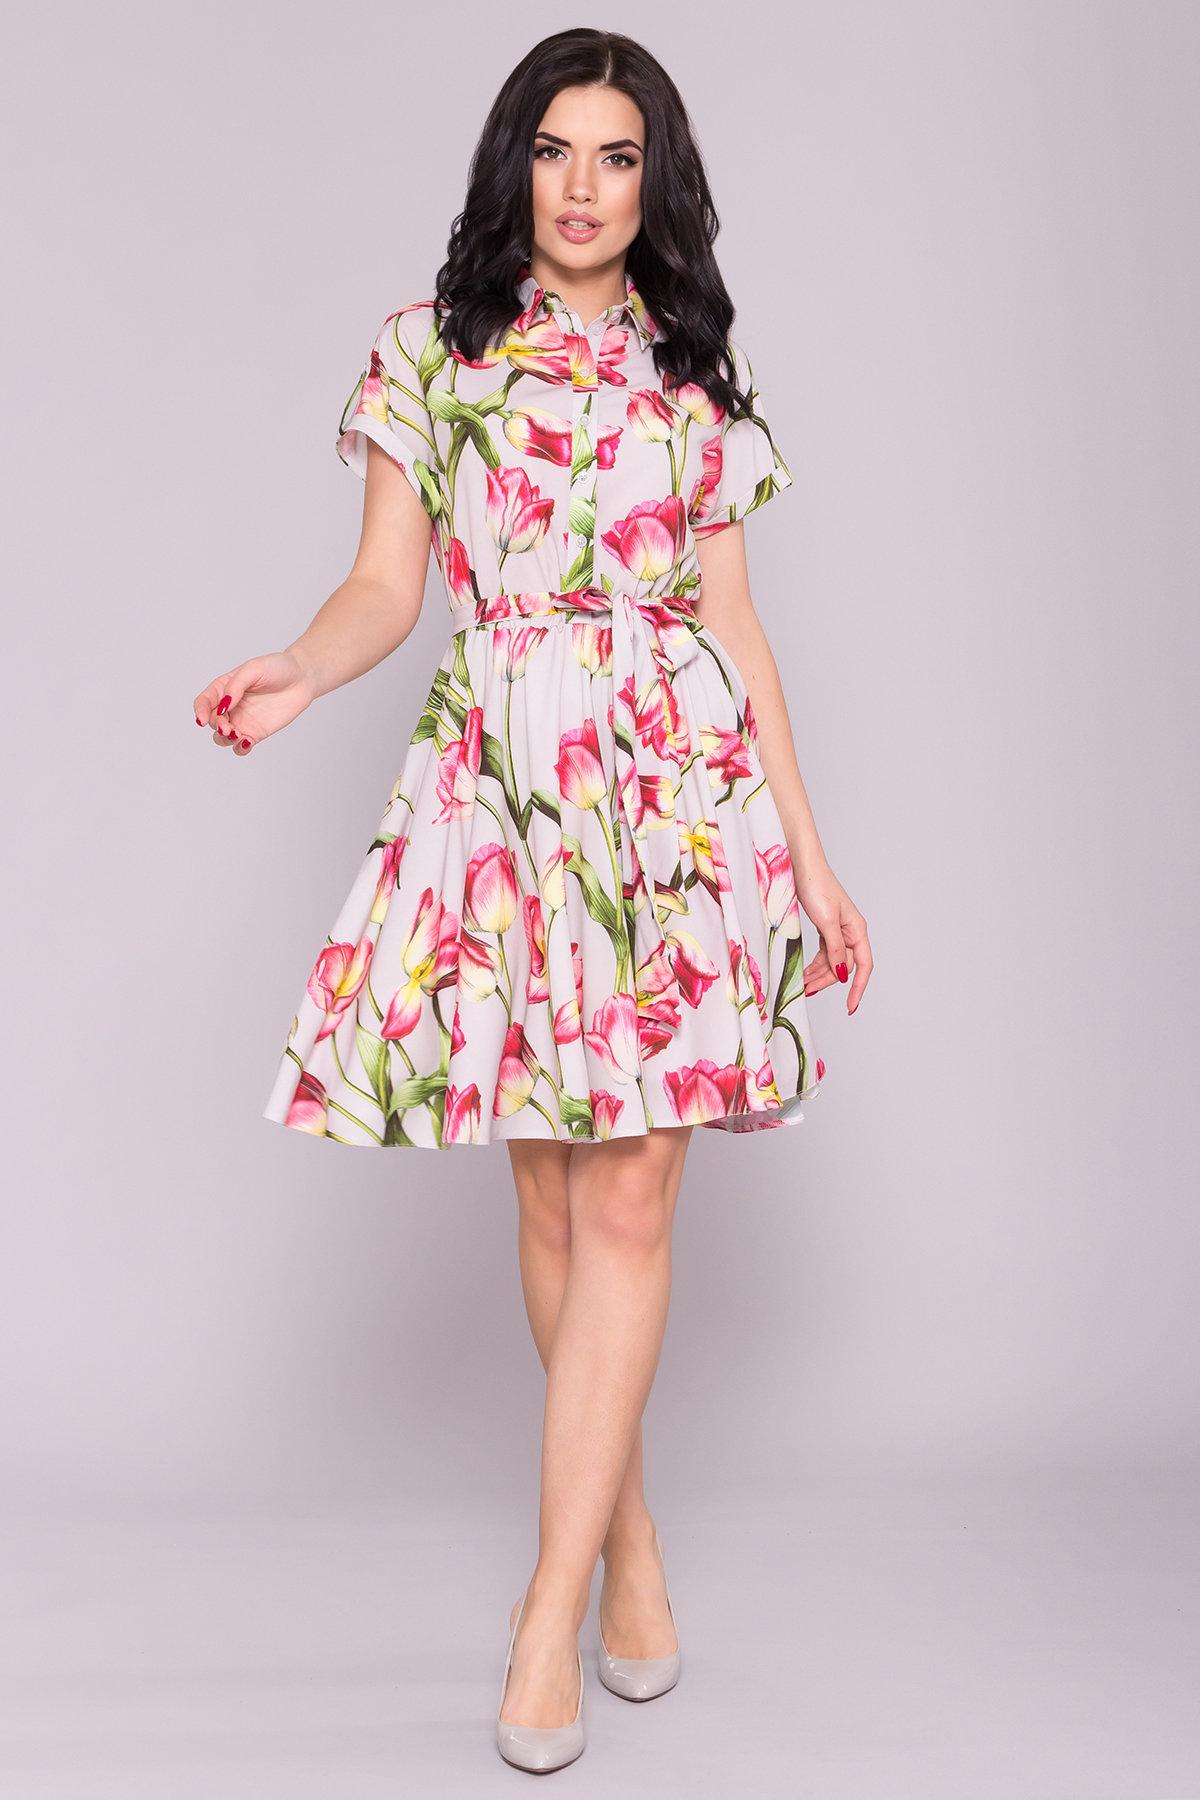 Платье Санжар 7061 Цвет: Тюльпан серый/розовый